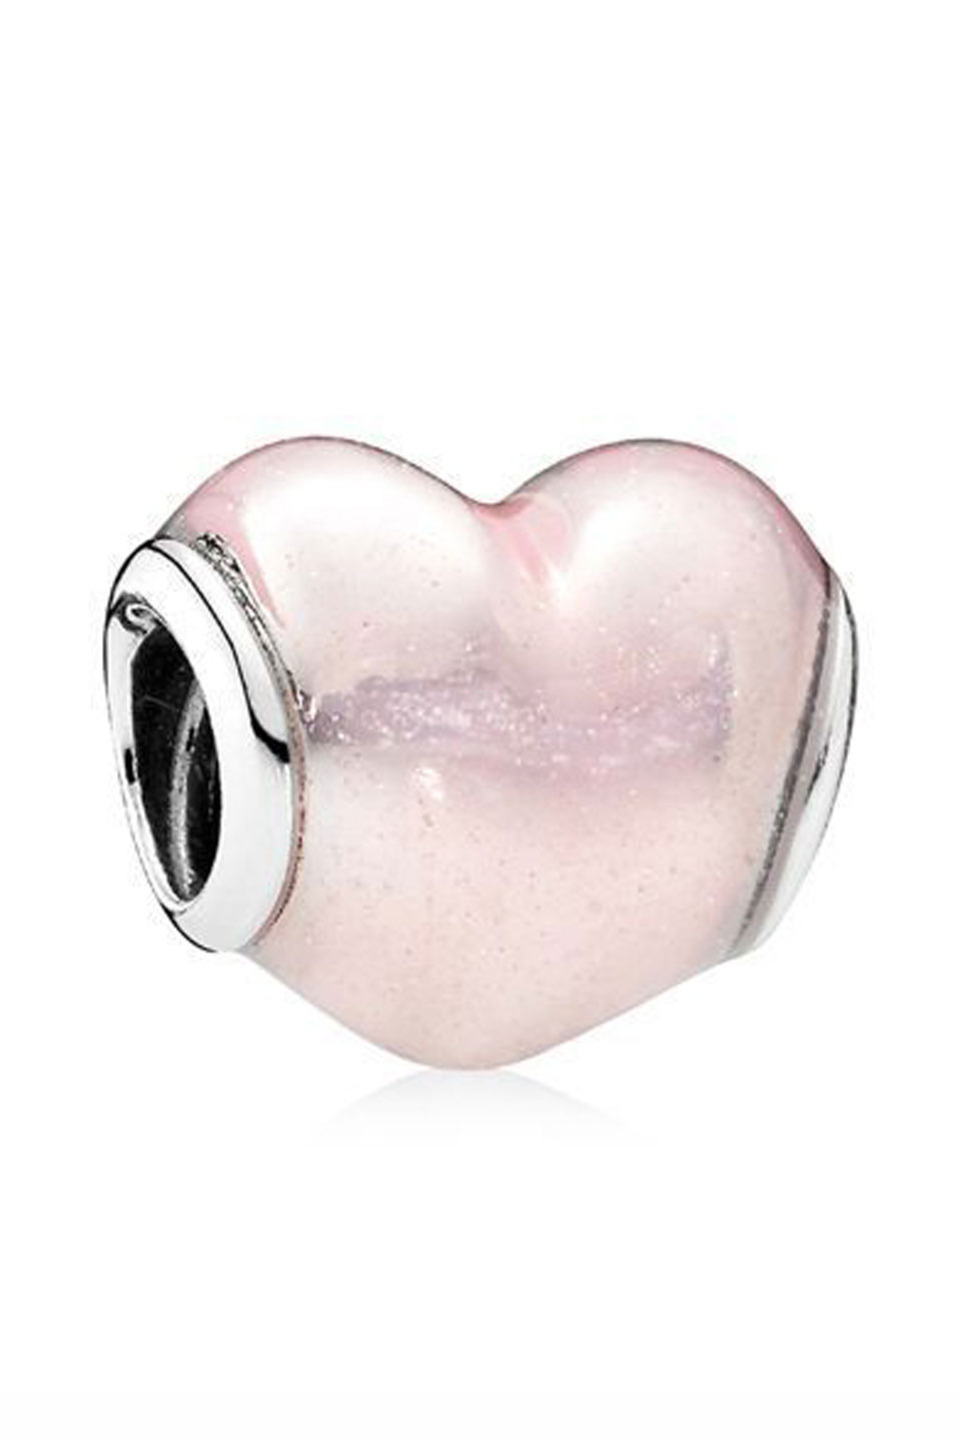 Pandora Charm in Pink